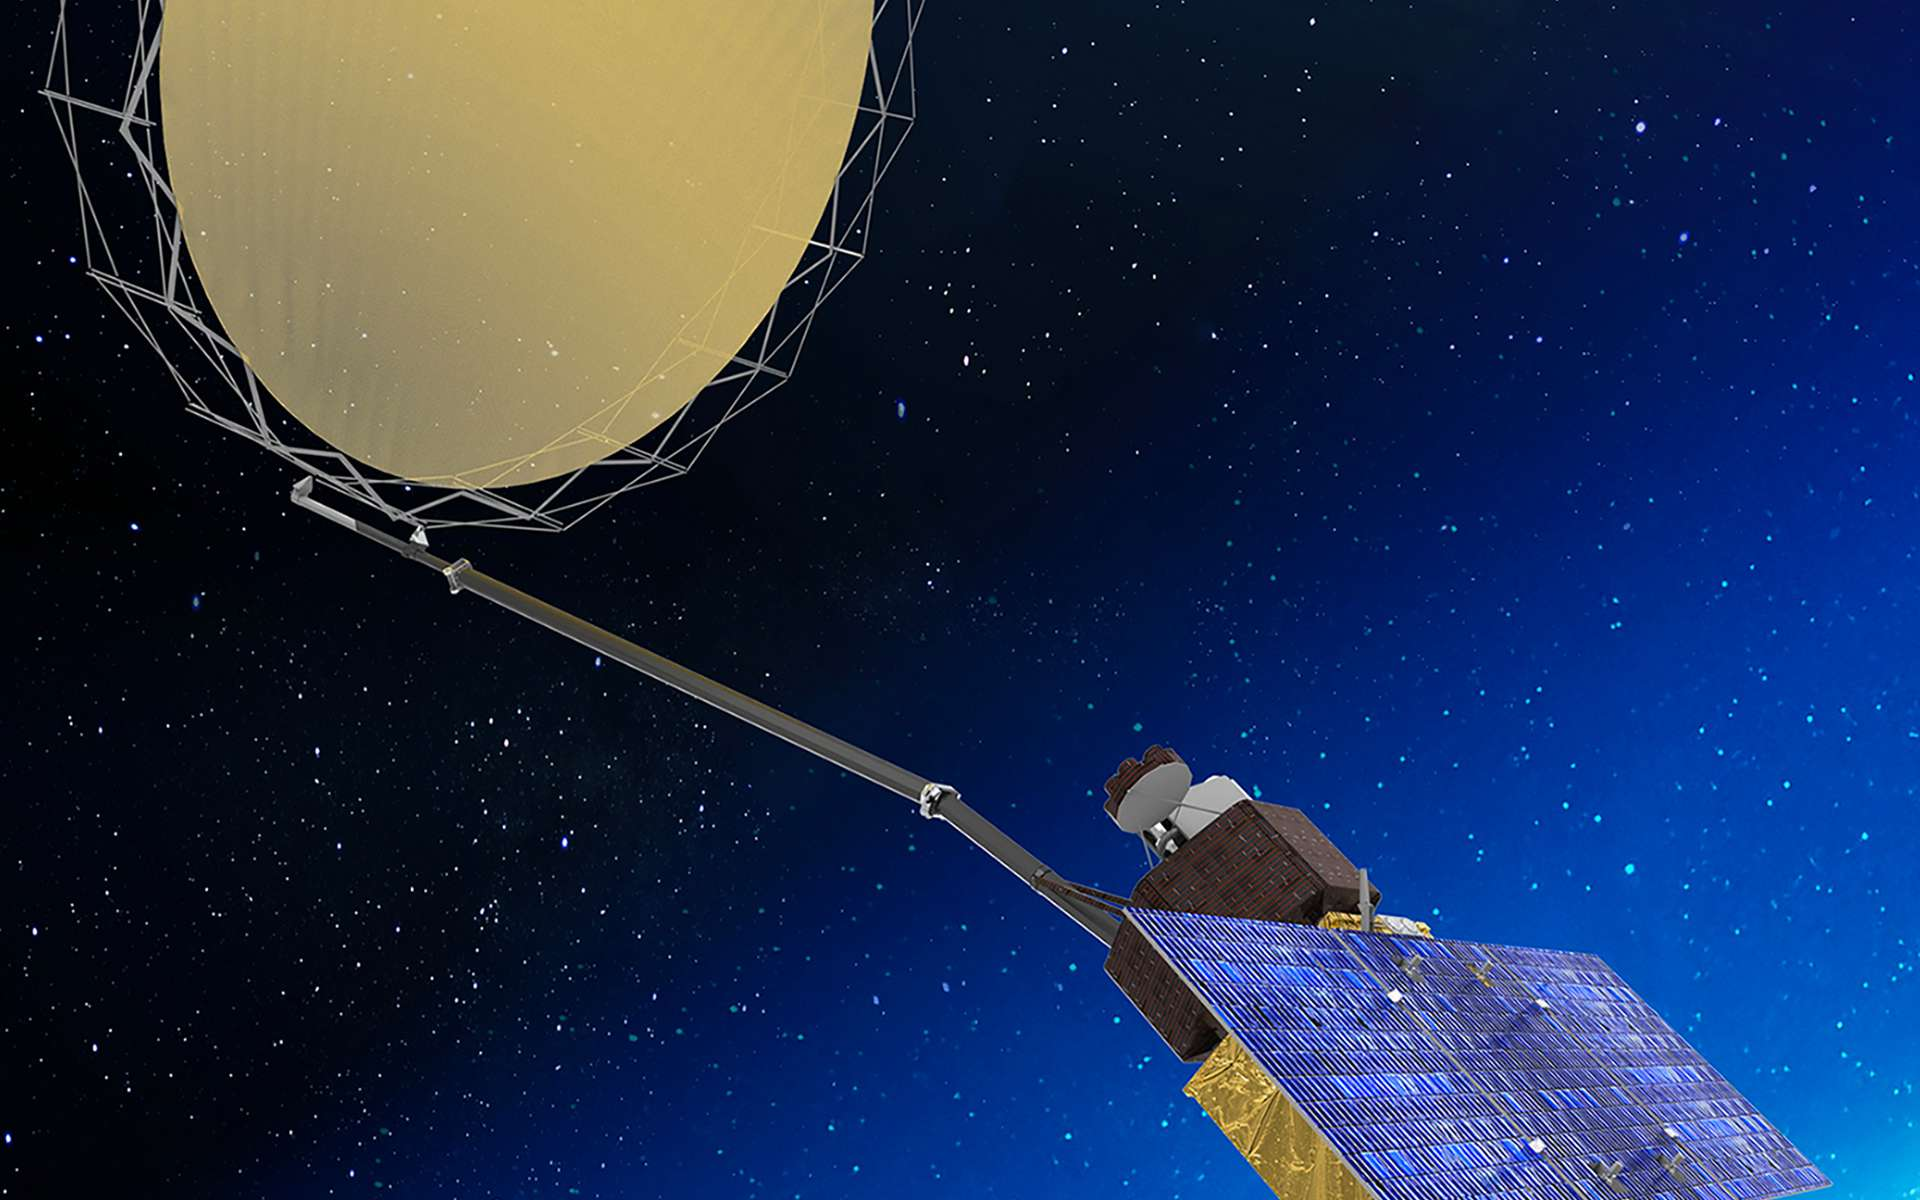 Copernicus Imaging Microwavve Radiometer, futur satellite Sentinel du programme Copernicus. © Thales Alenia Space